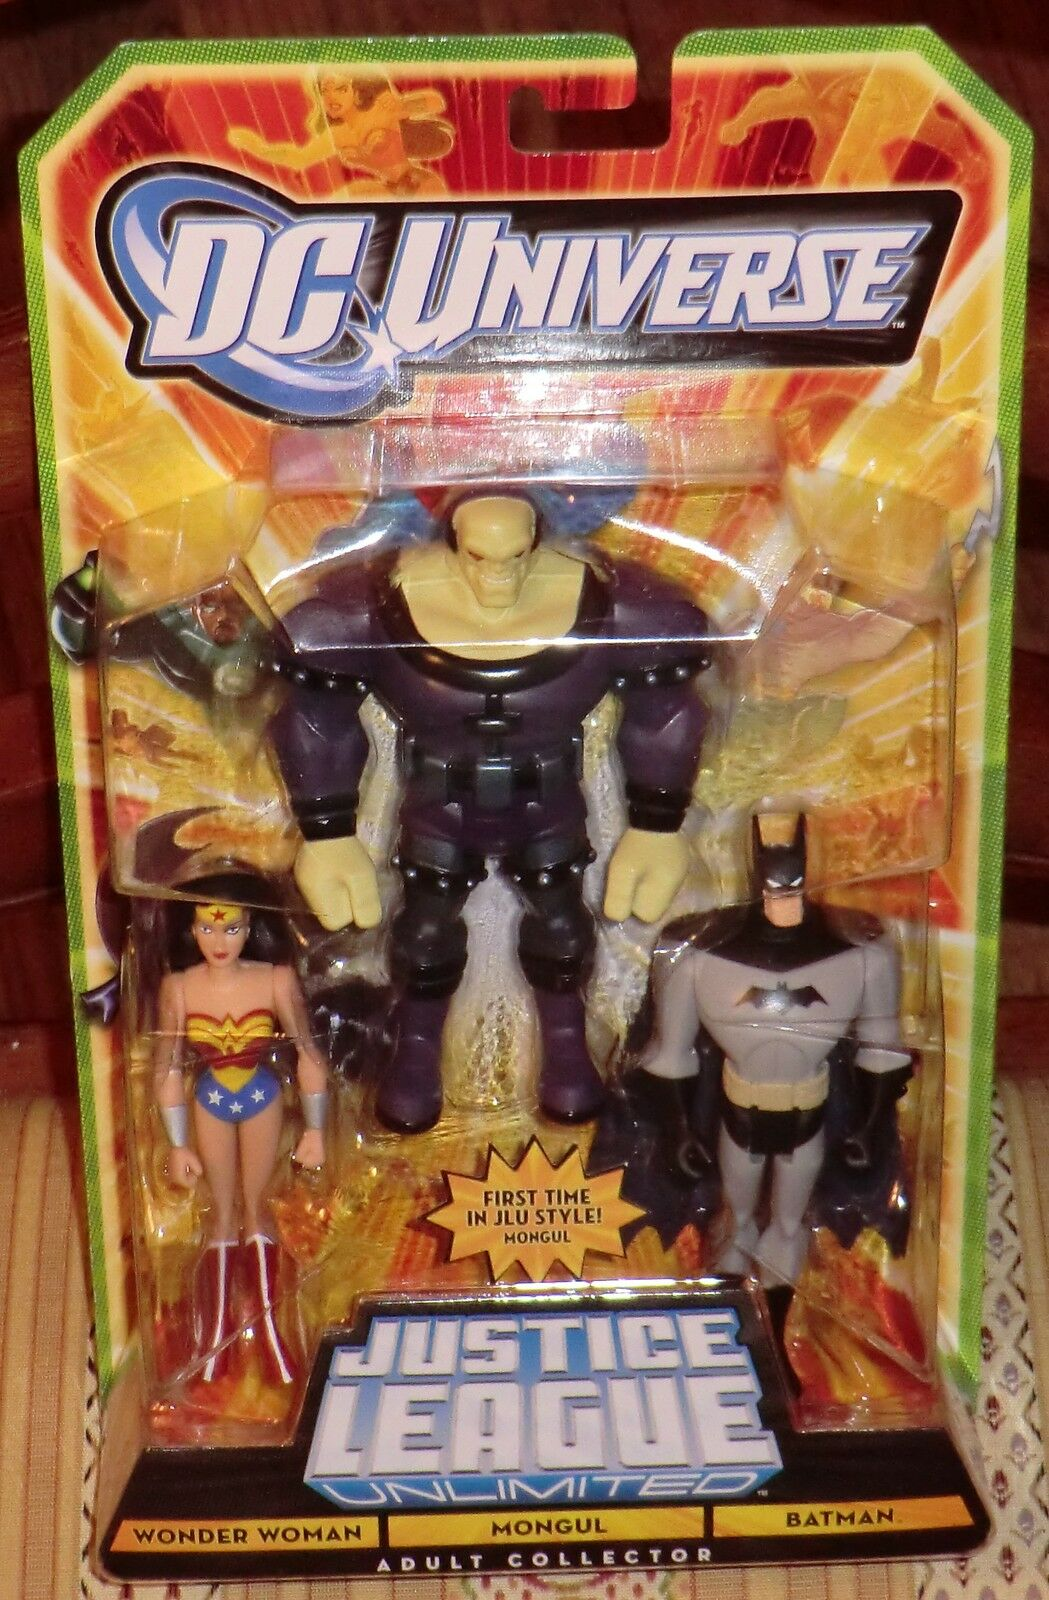 Dc - universum jlu unbegrenzte batman, mongul, wonder woman - matty exklusiv